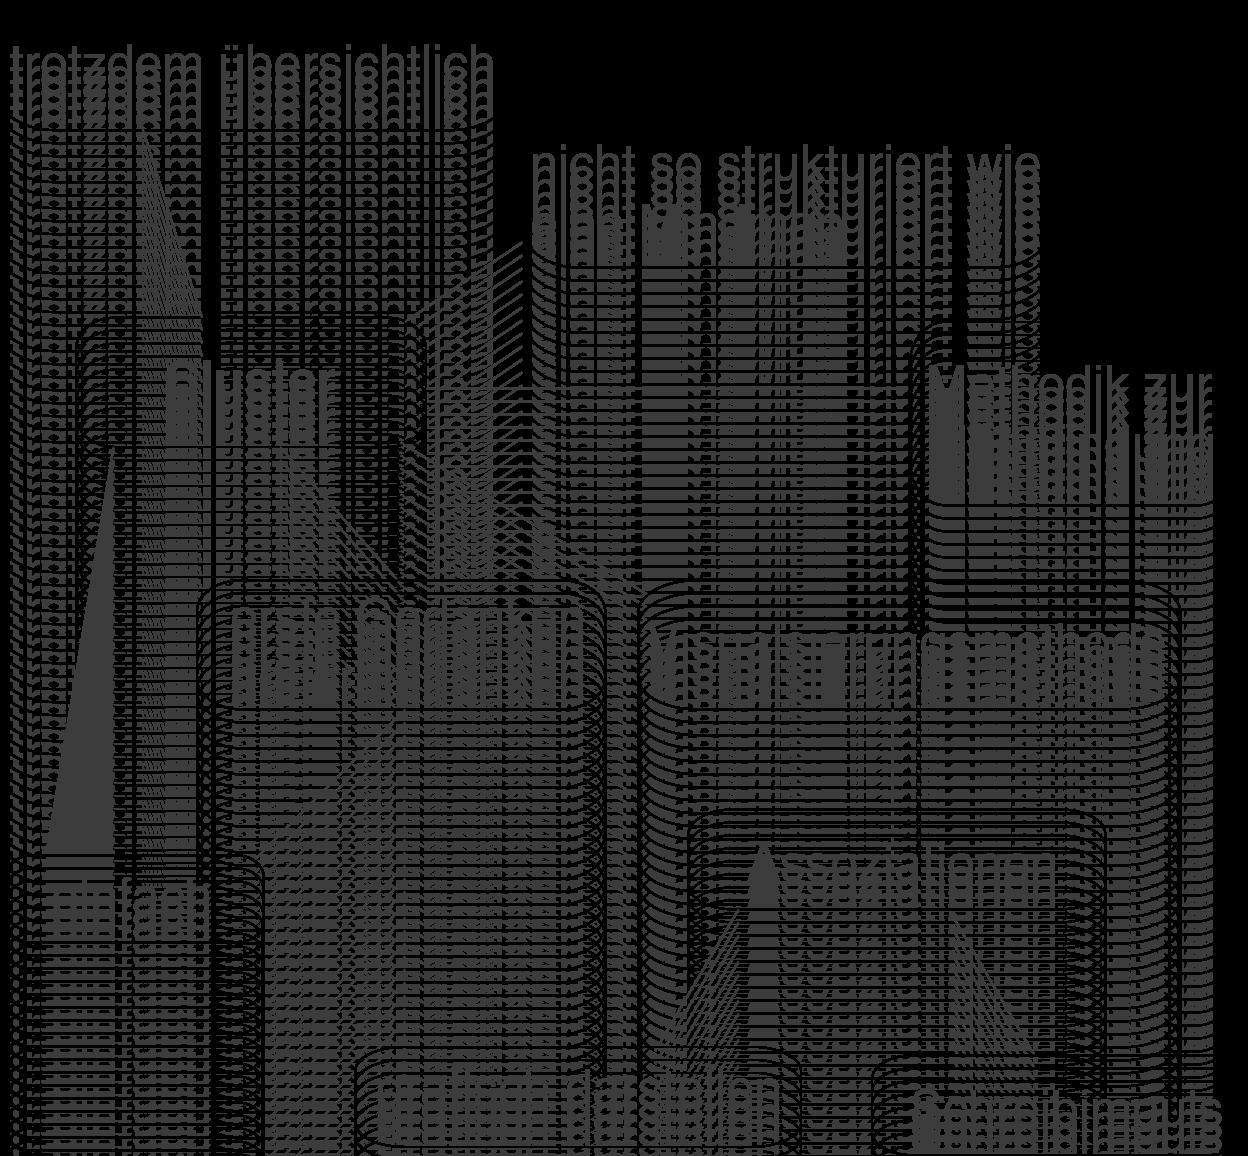 Methoden: Brainstorming, Mindmap, Cluster